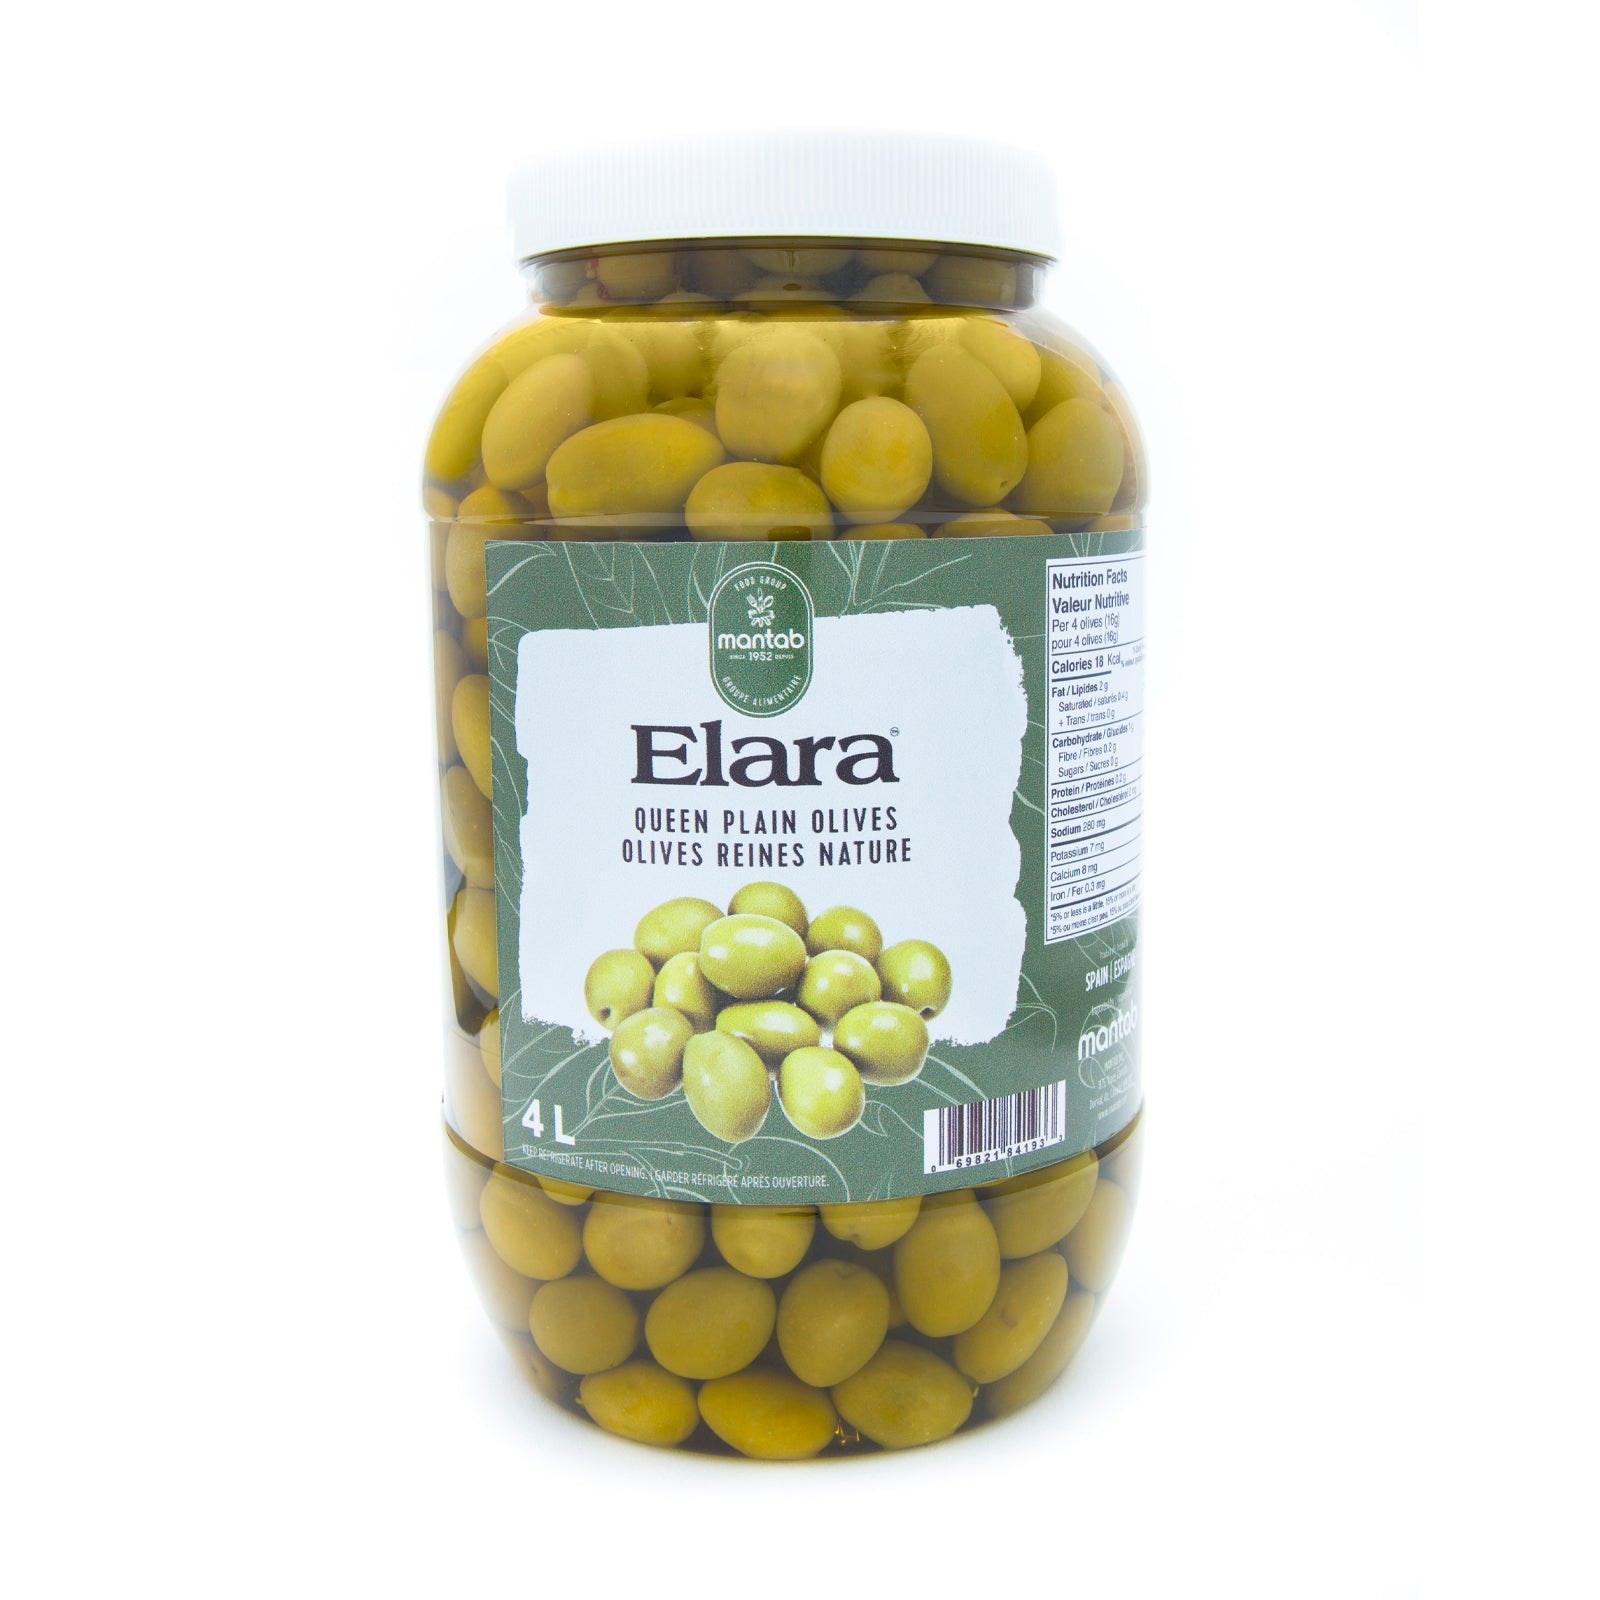 Elara Queen Plain Olives